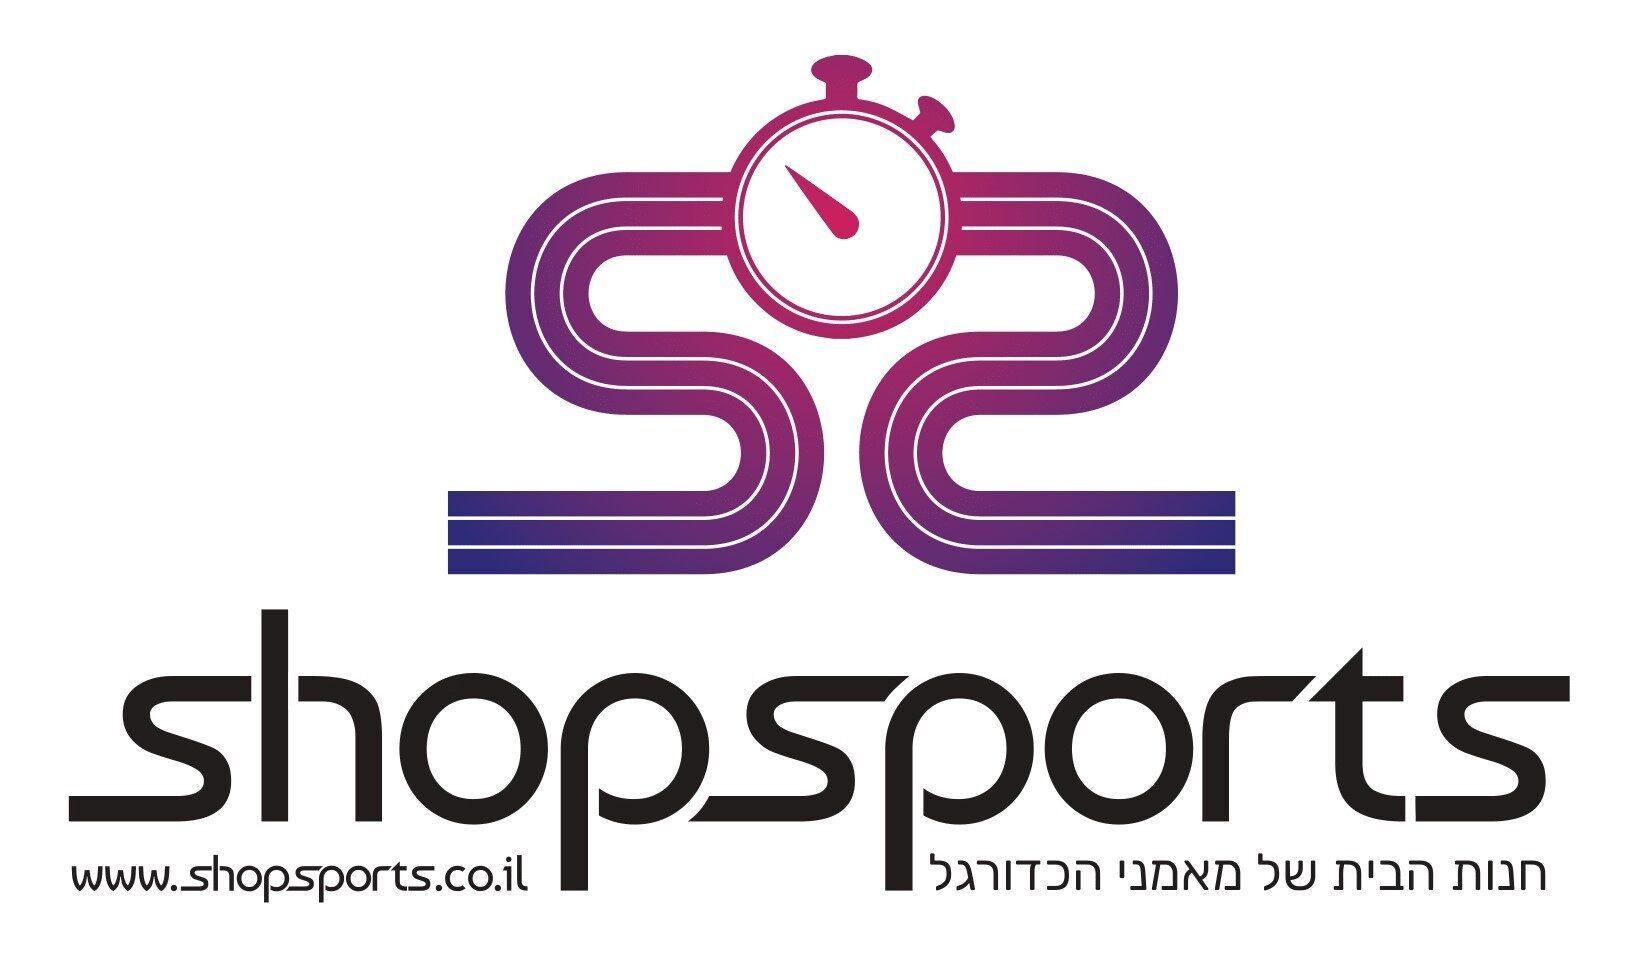 ShopSports